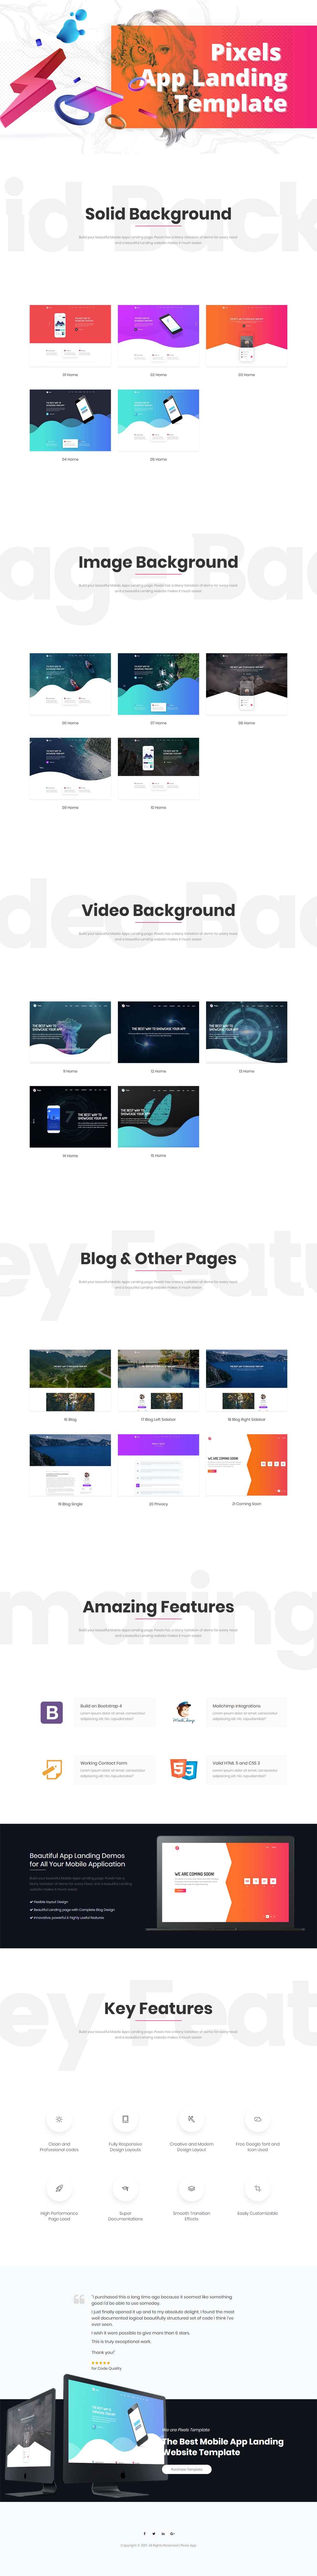 Pixels – Responsive Creative App Landing HTML5 Template